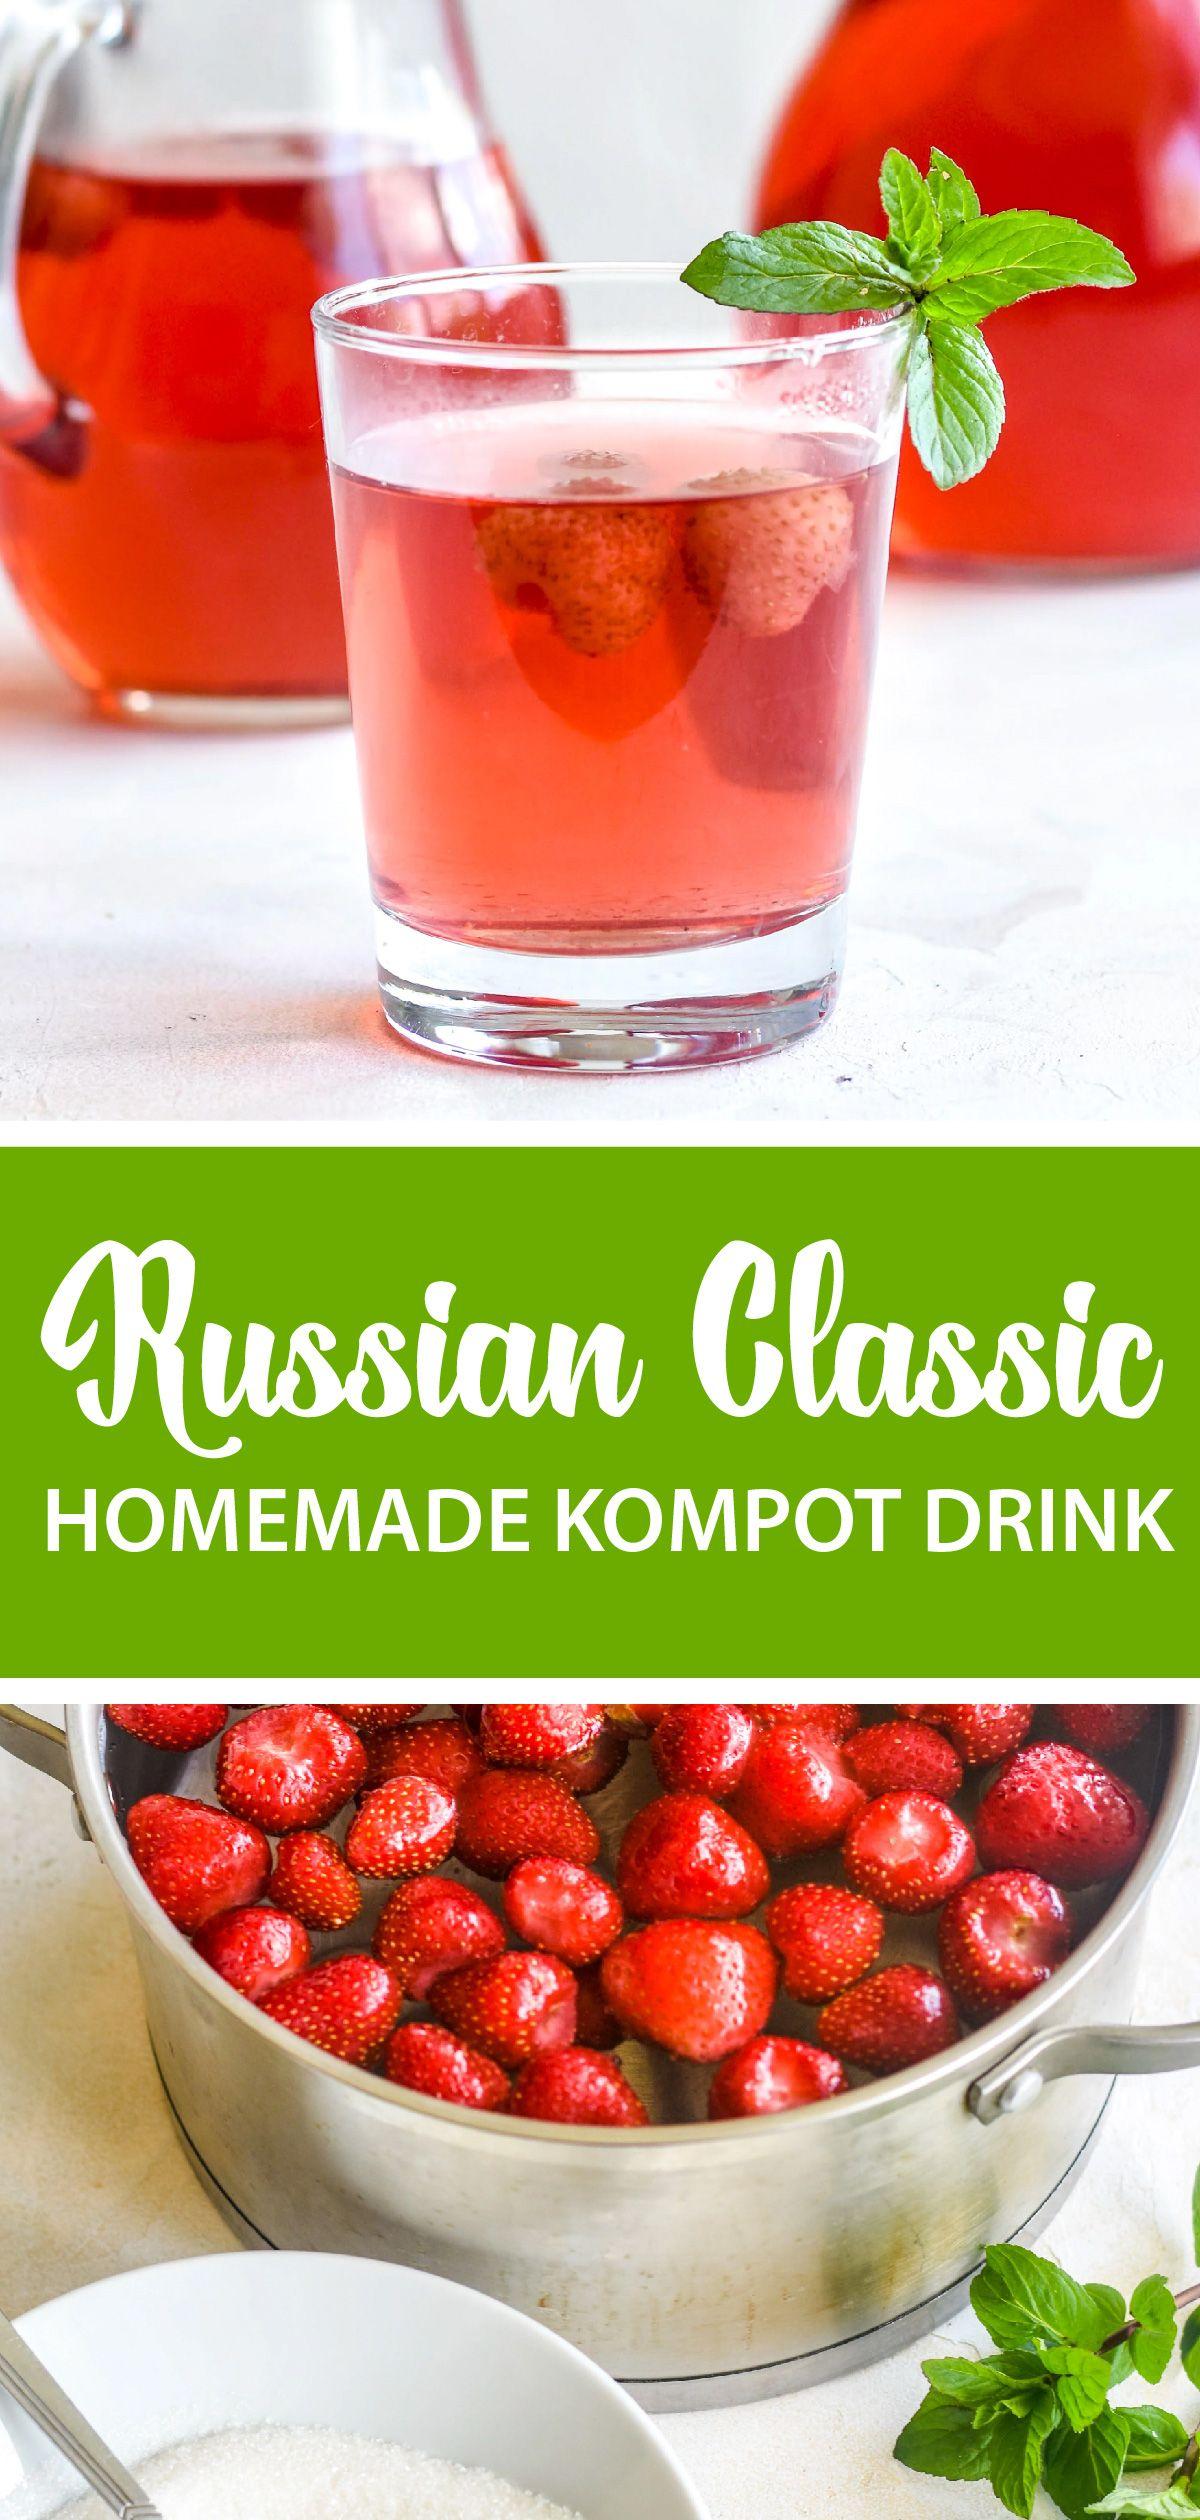 Homemade Kompot Drink Homemade Drinks Homemade Recipes Yummy Drinks